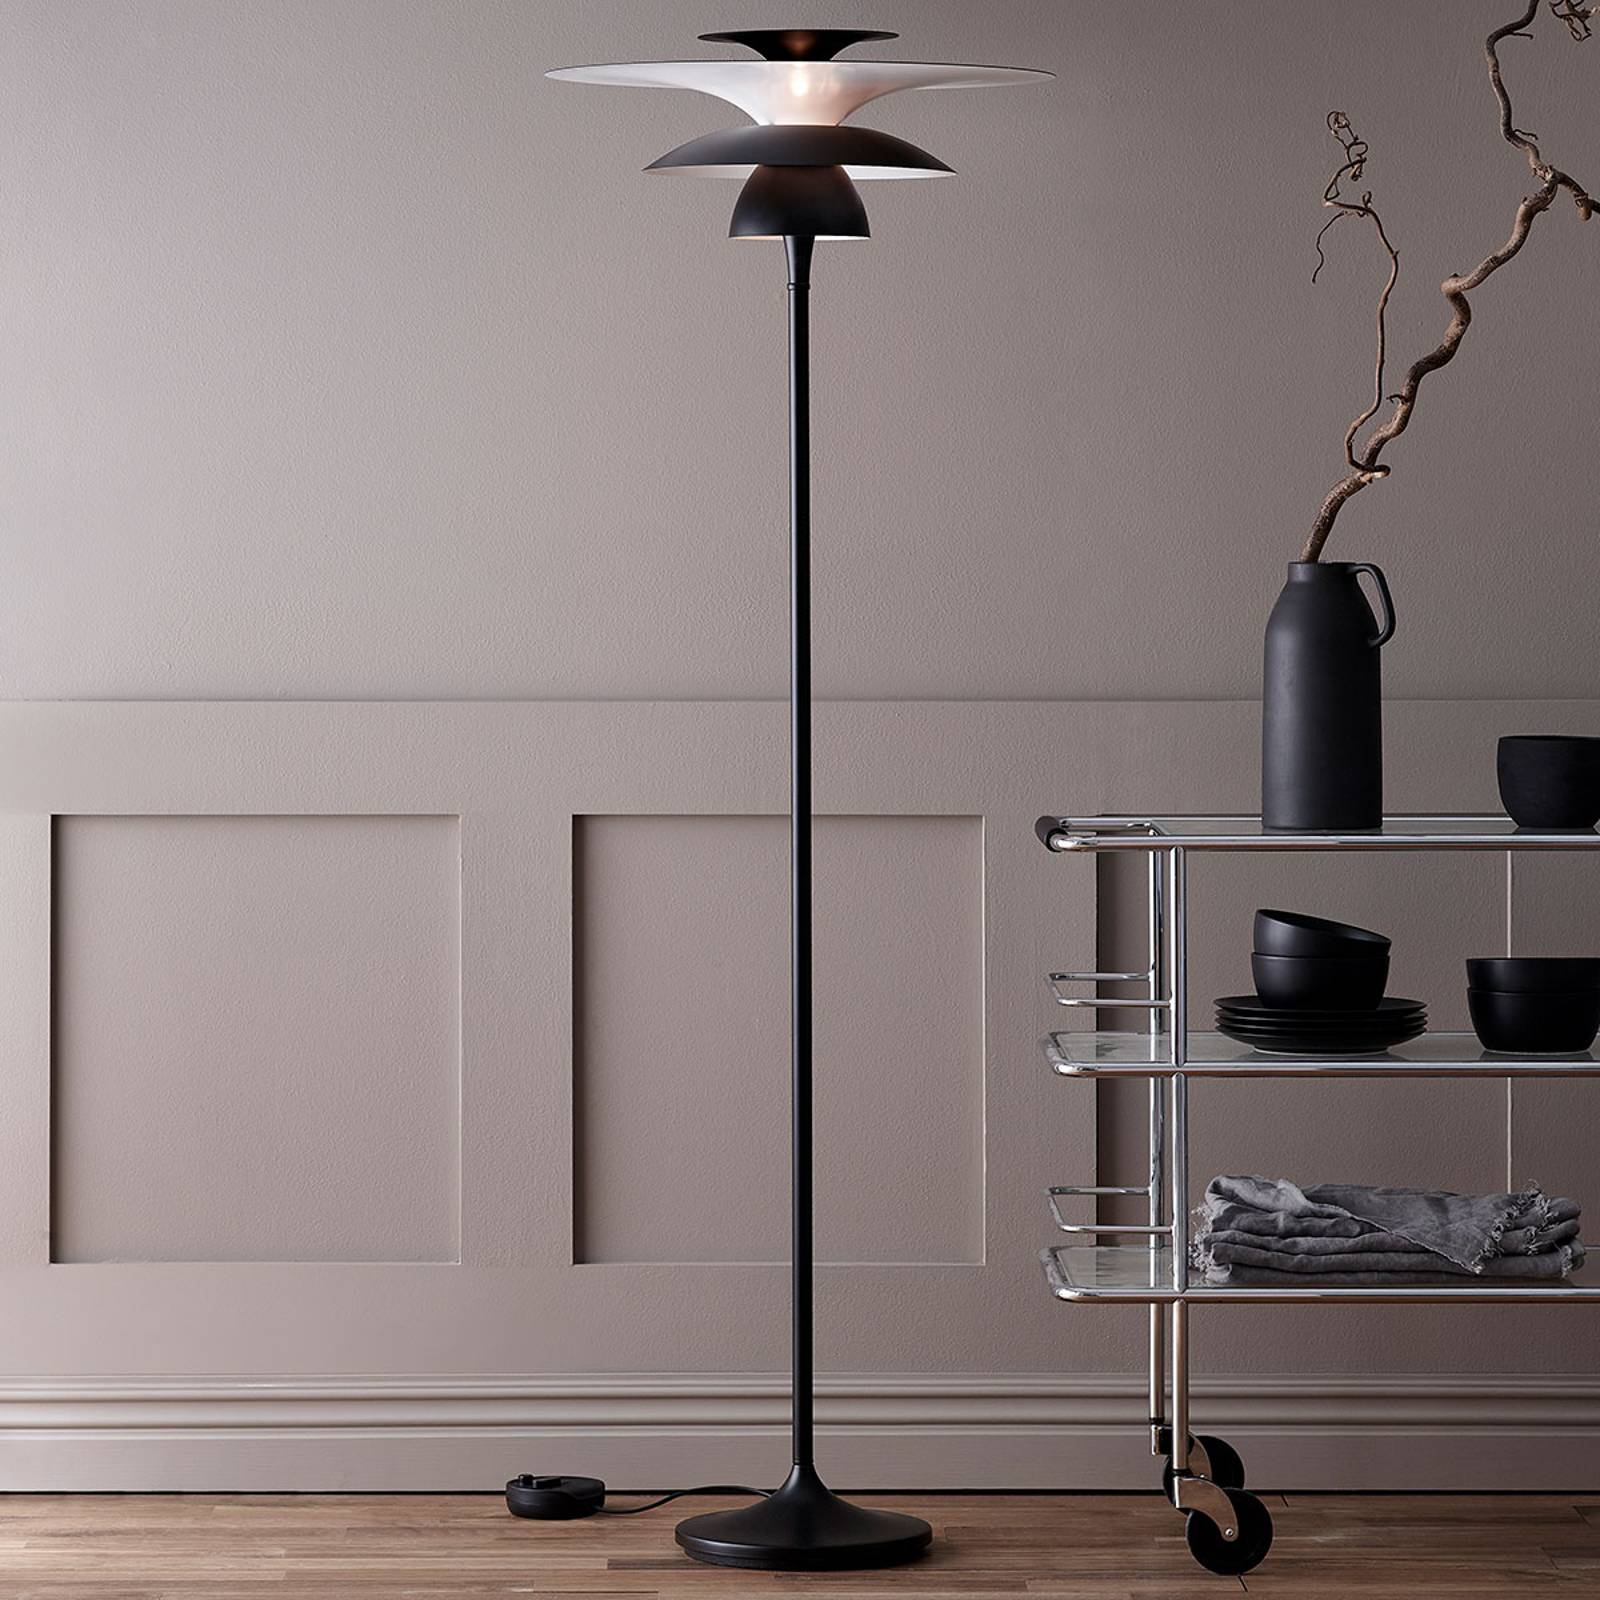 Picasso-LED-lattiavalo, varjostin 38 cm, musta